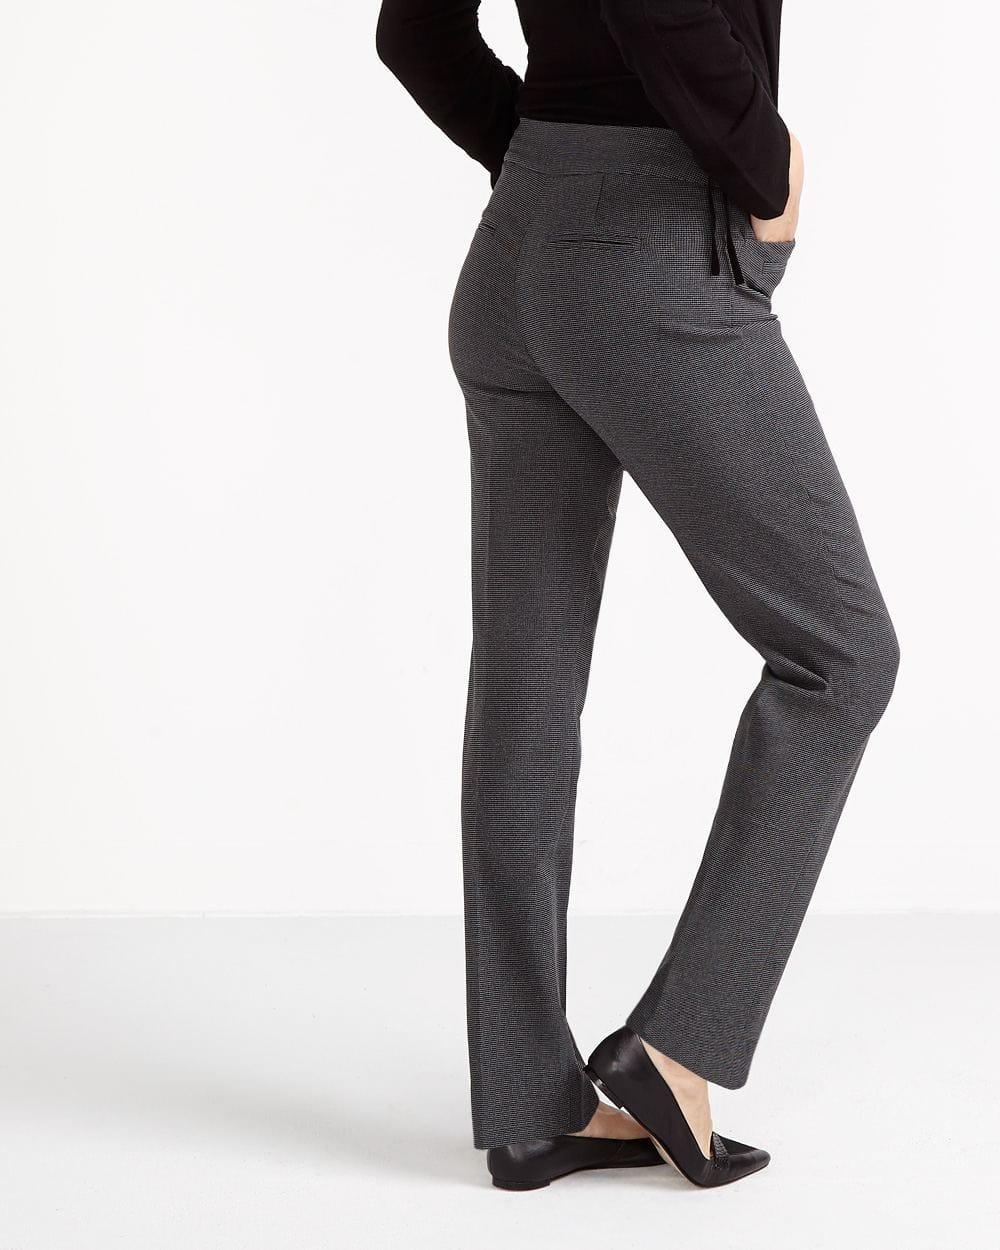 The Iconic Straight Leg Printed Pants